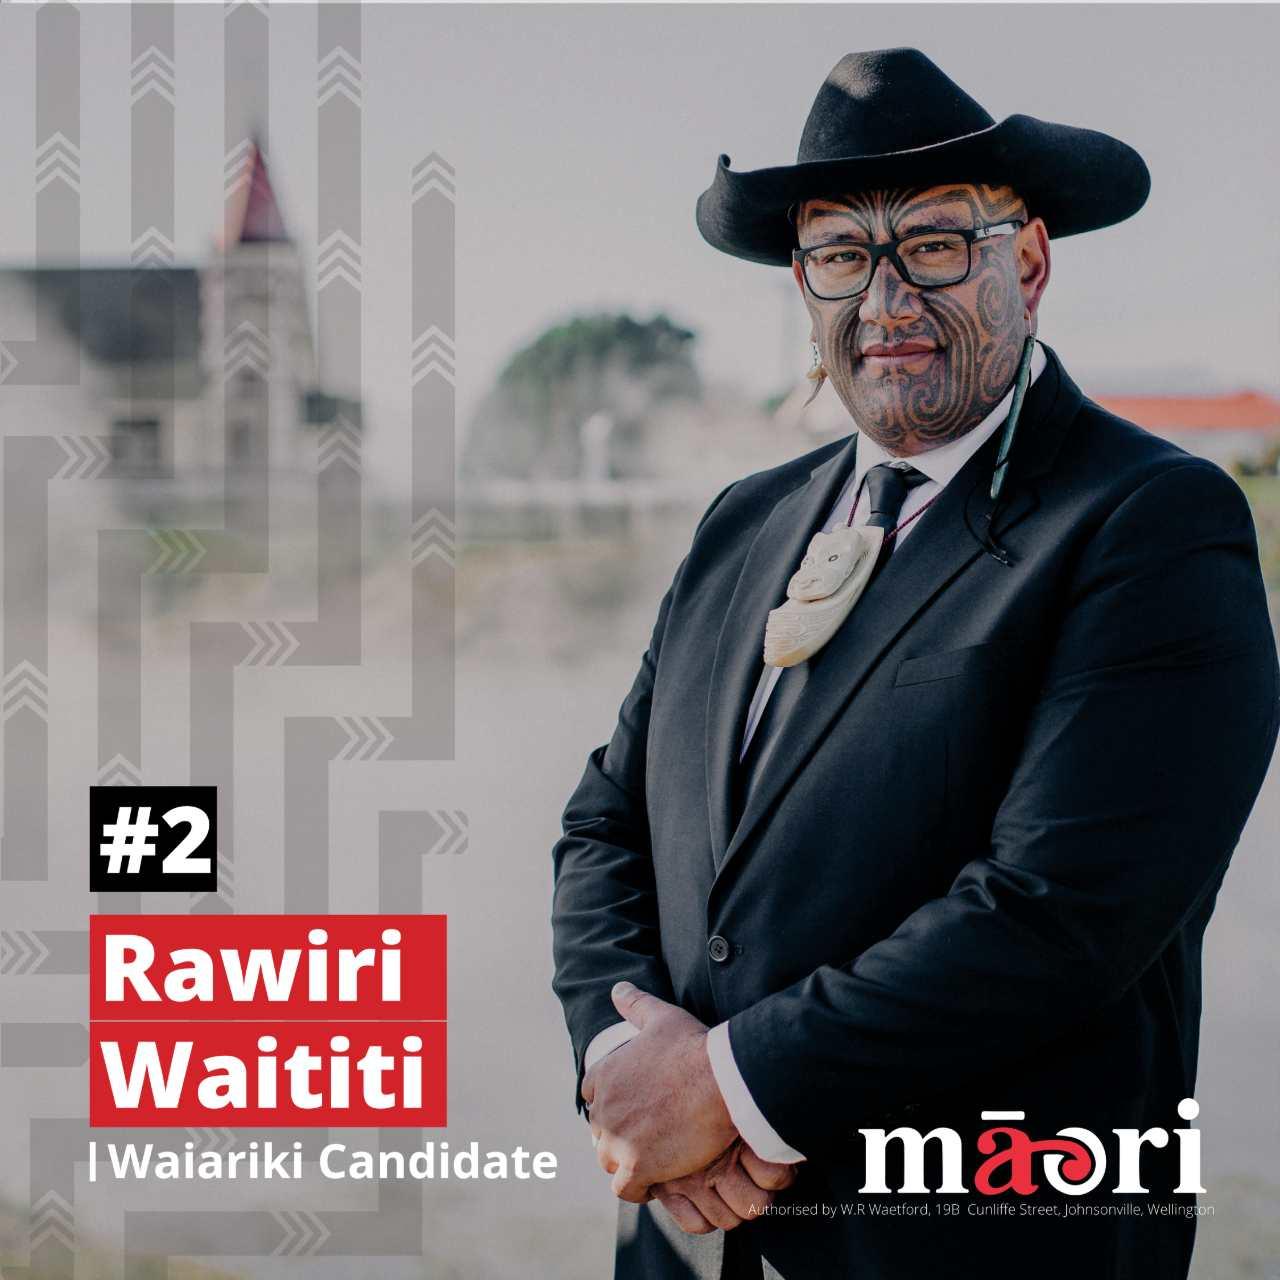 Rawiri Waititi, Waiariki Candidate